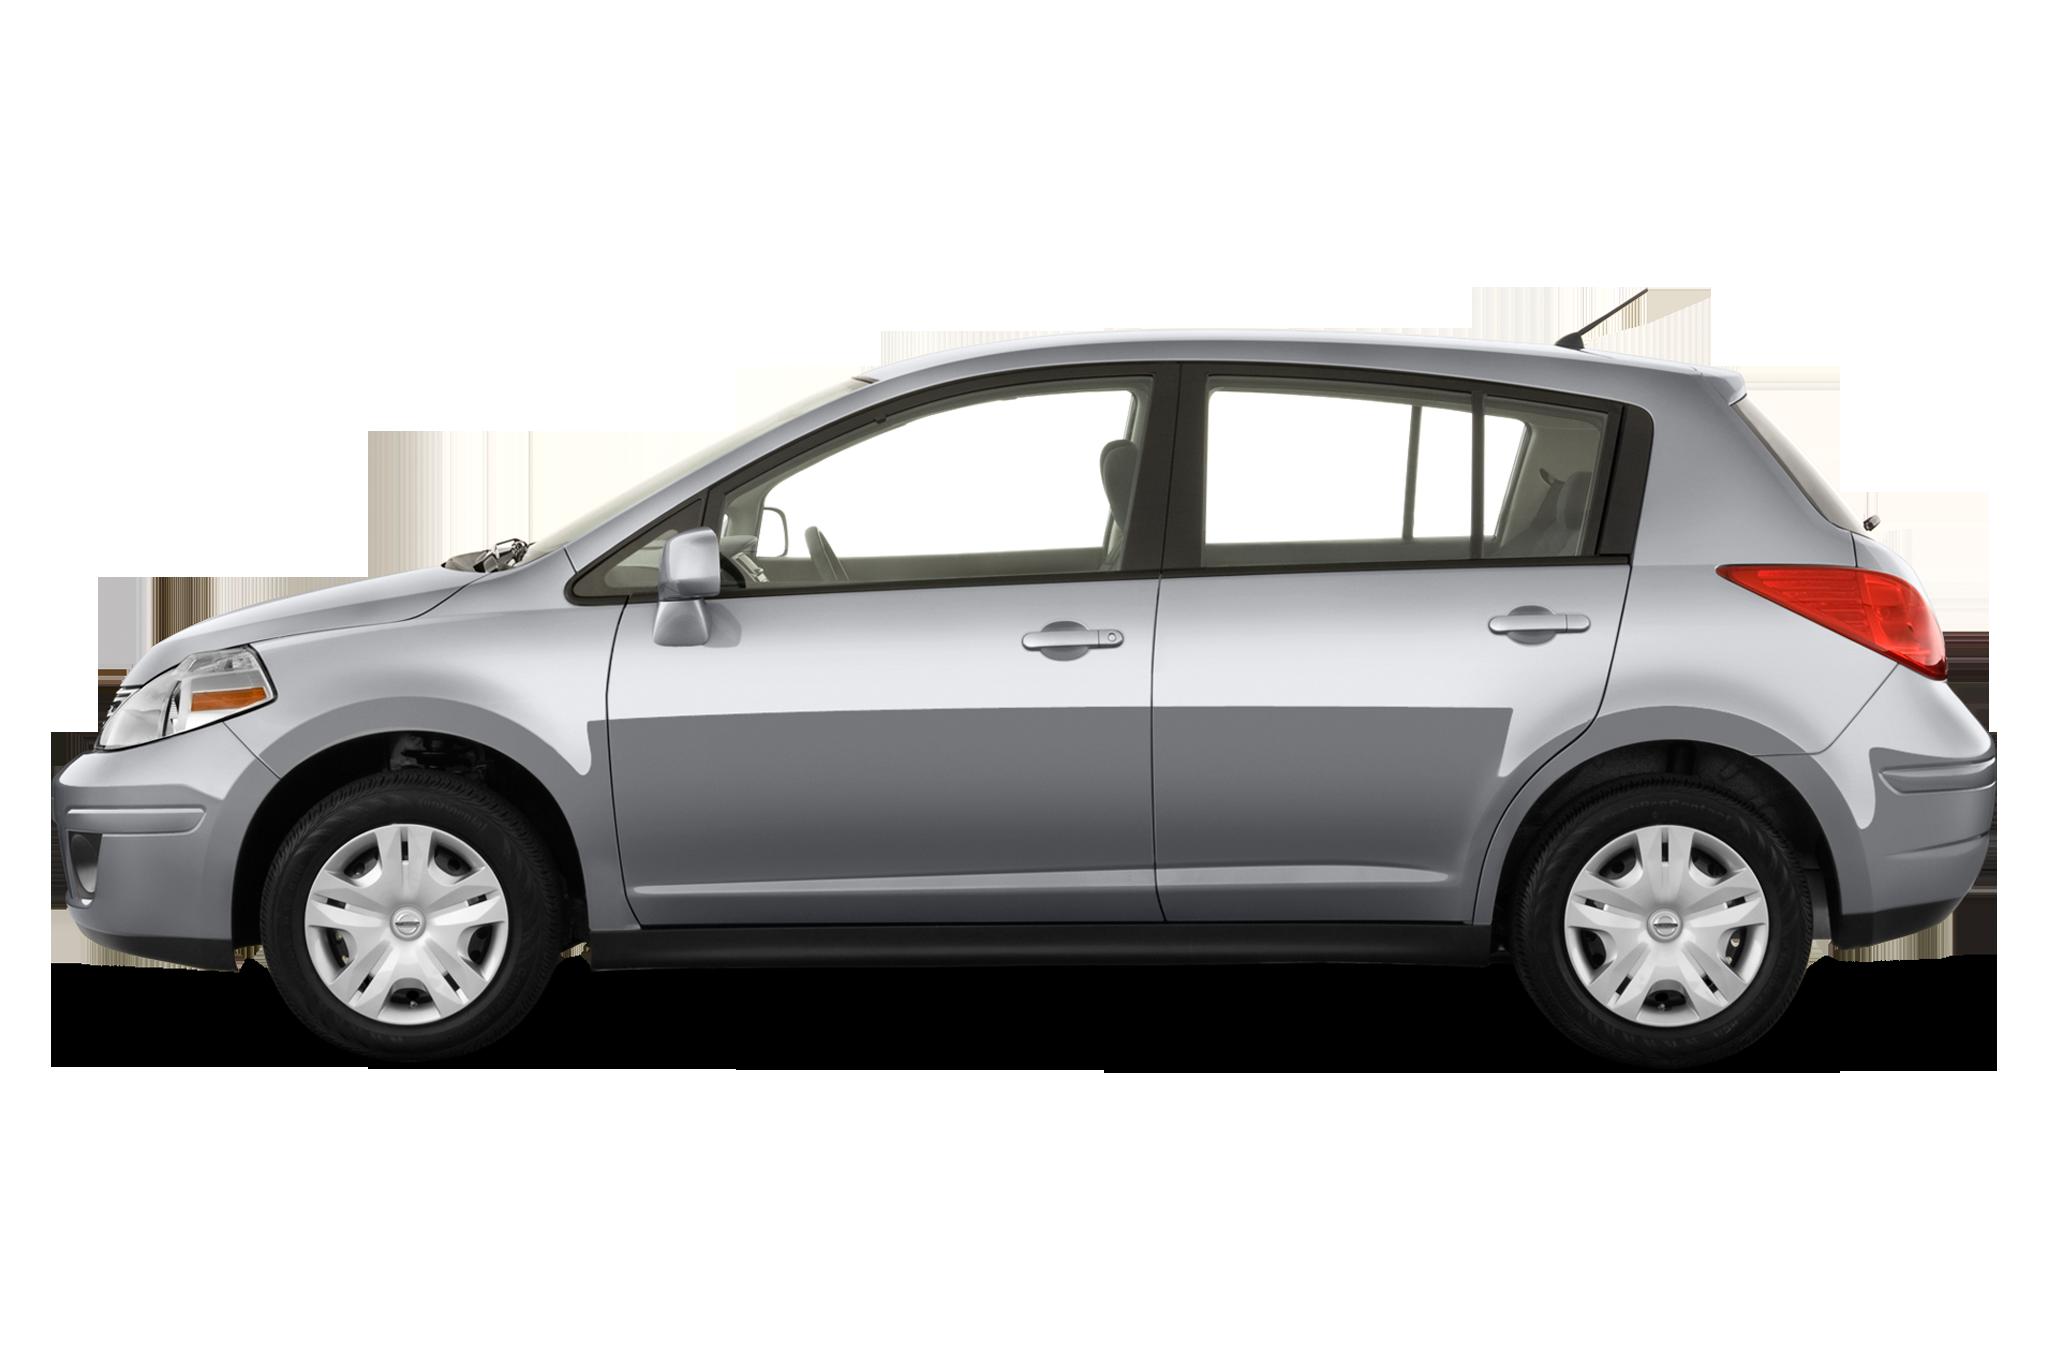 2010 Nissan Versa Sedan 1.6 - Nissan Compact Sedan Review ...